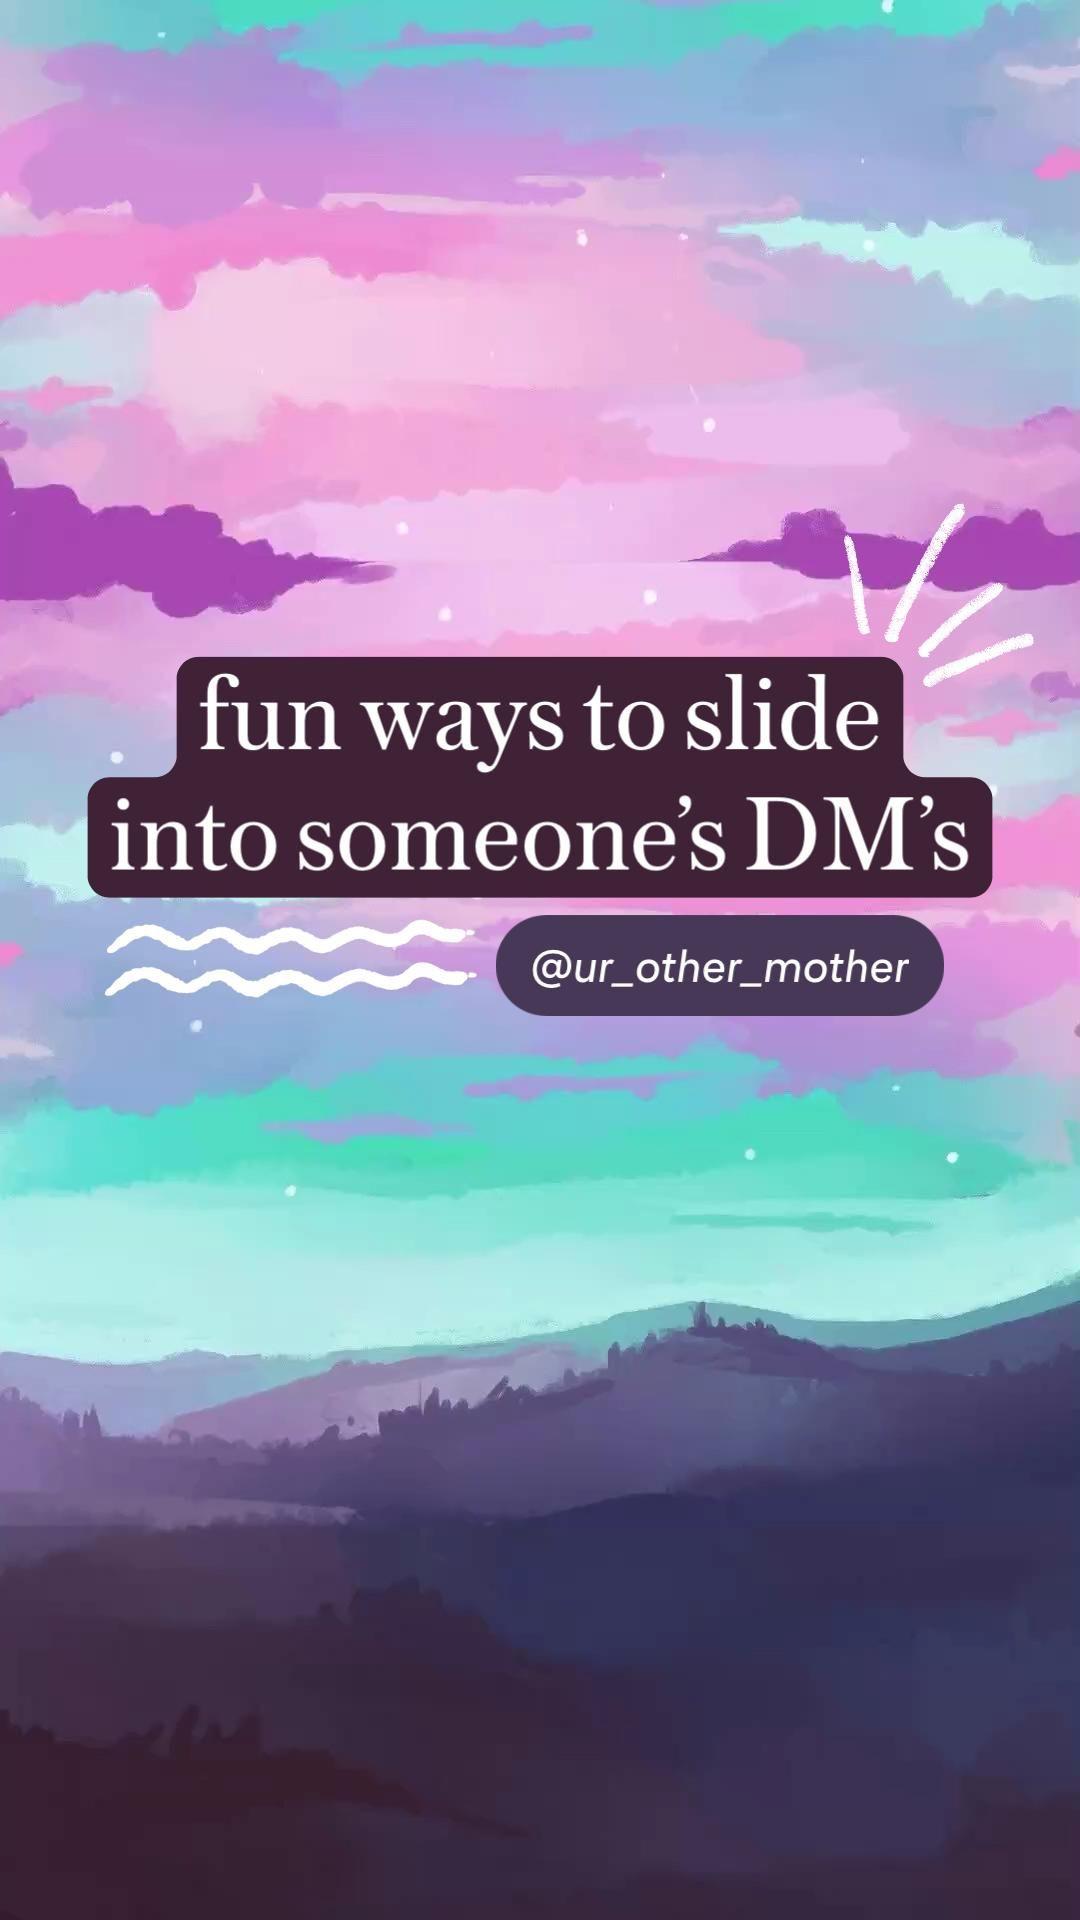 fun ways to slide into someone's DM's